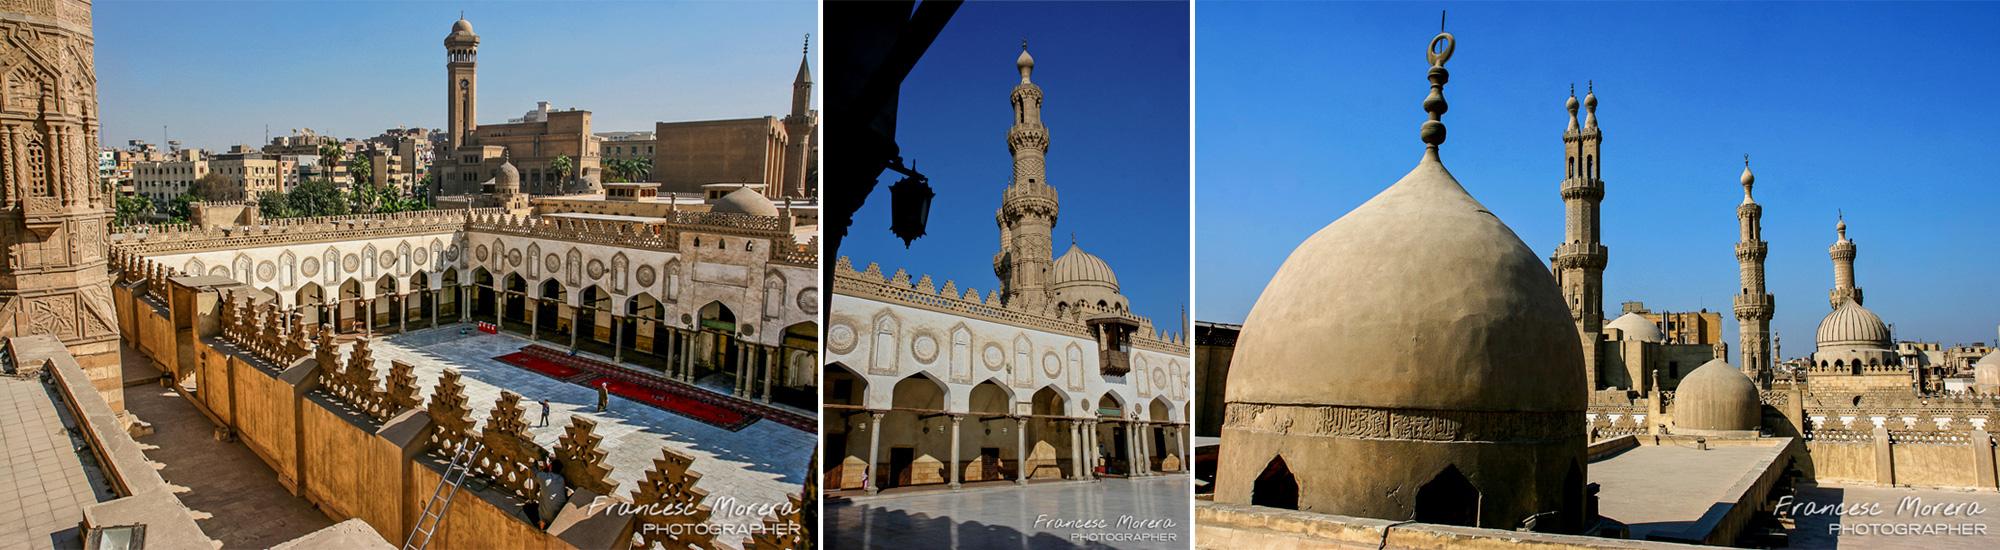 mezquita_al-azhar